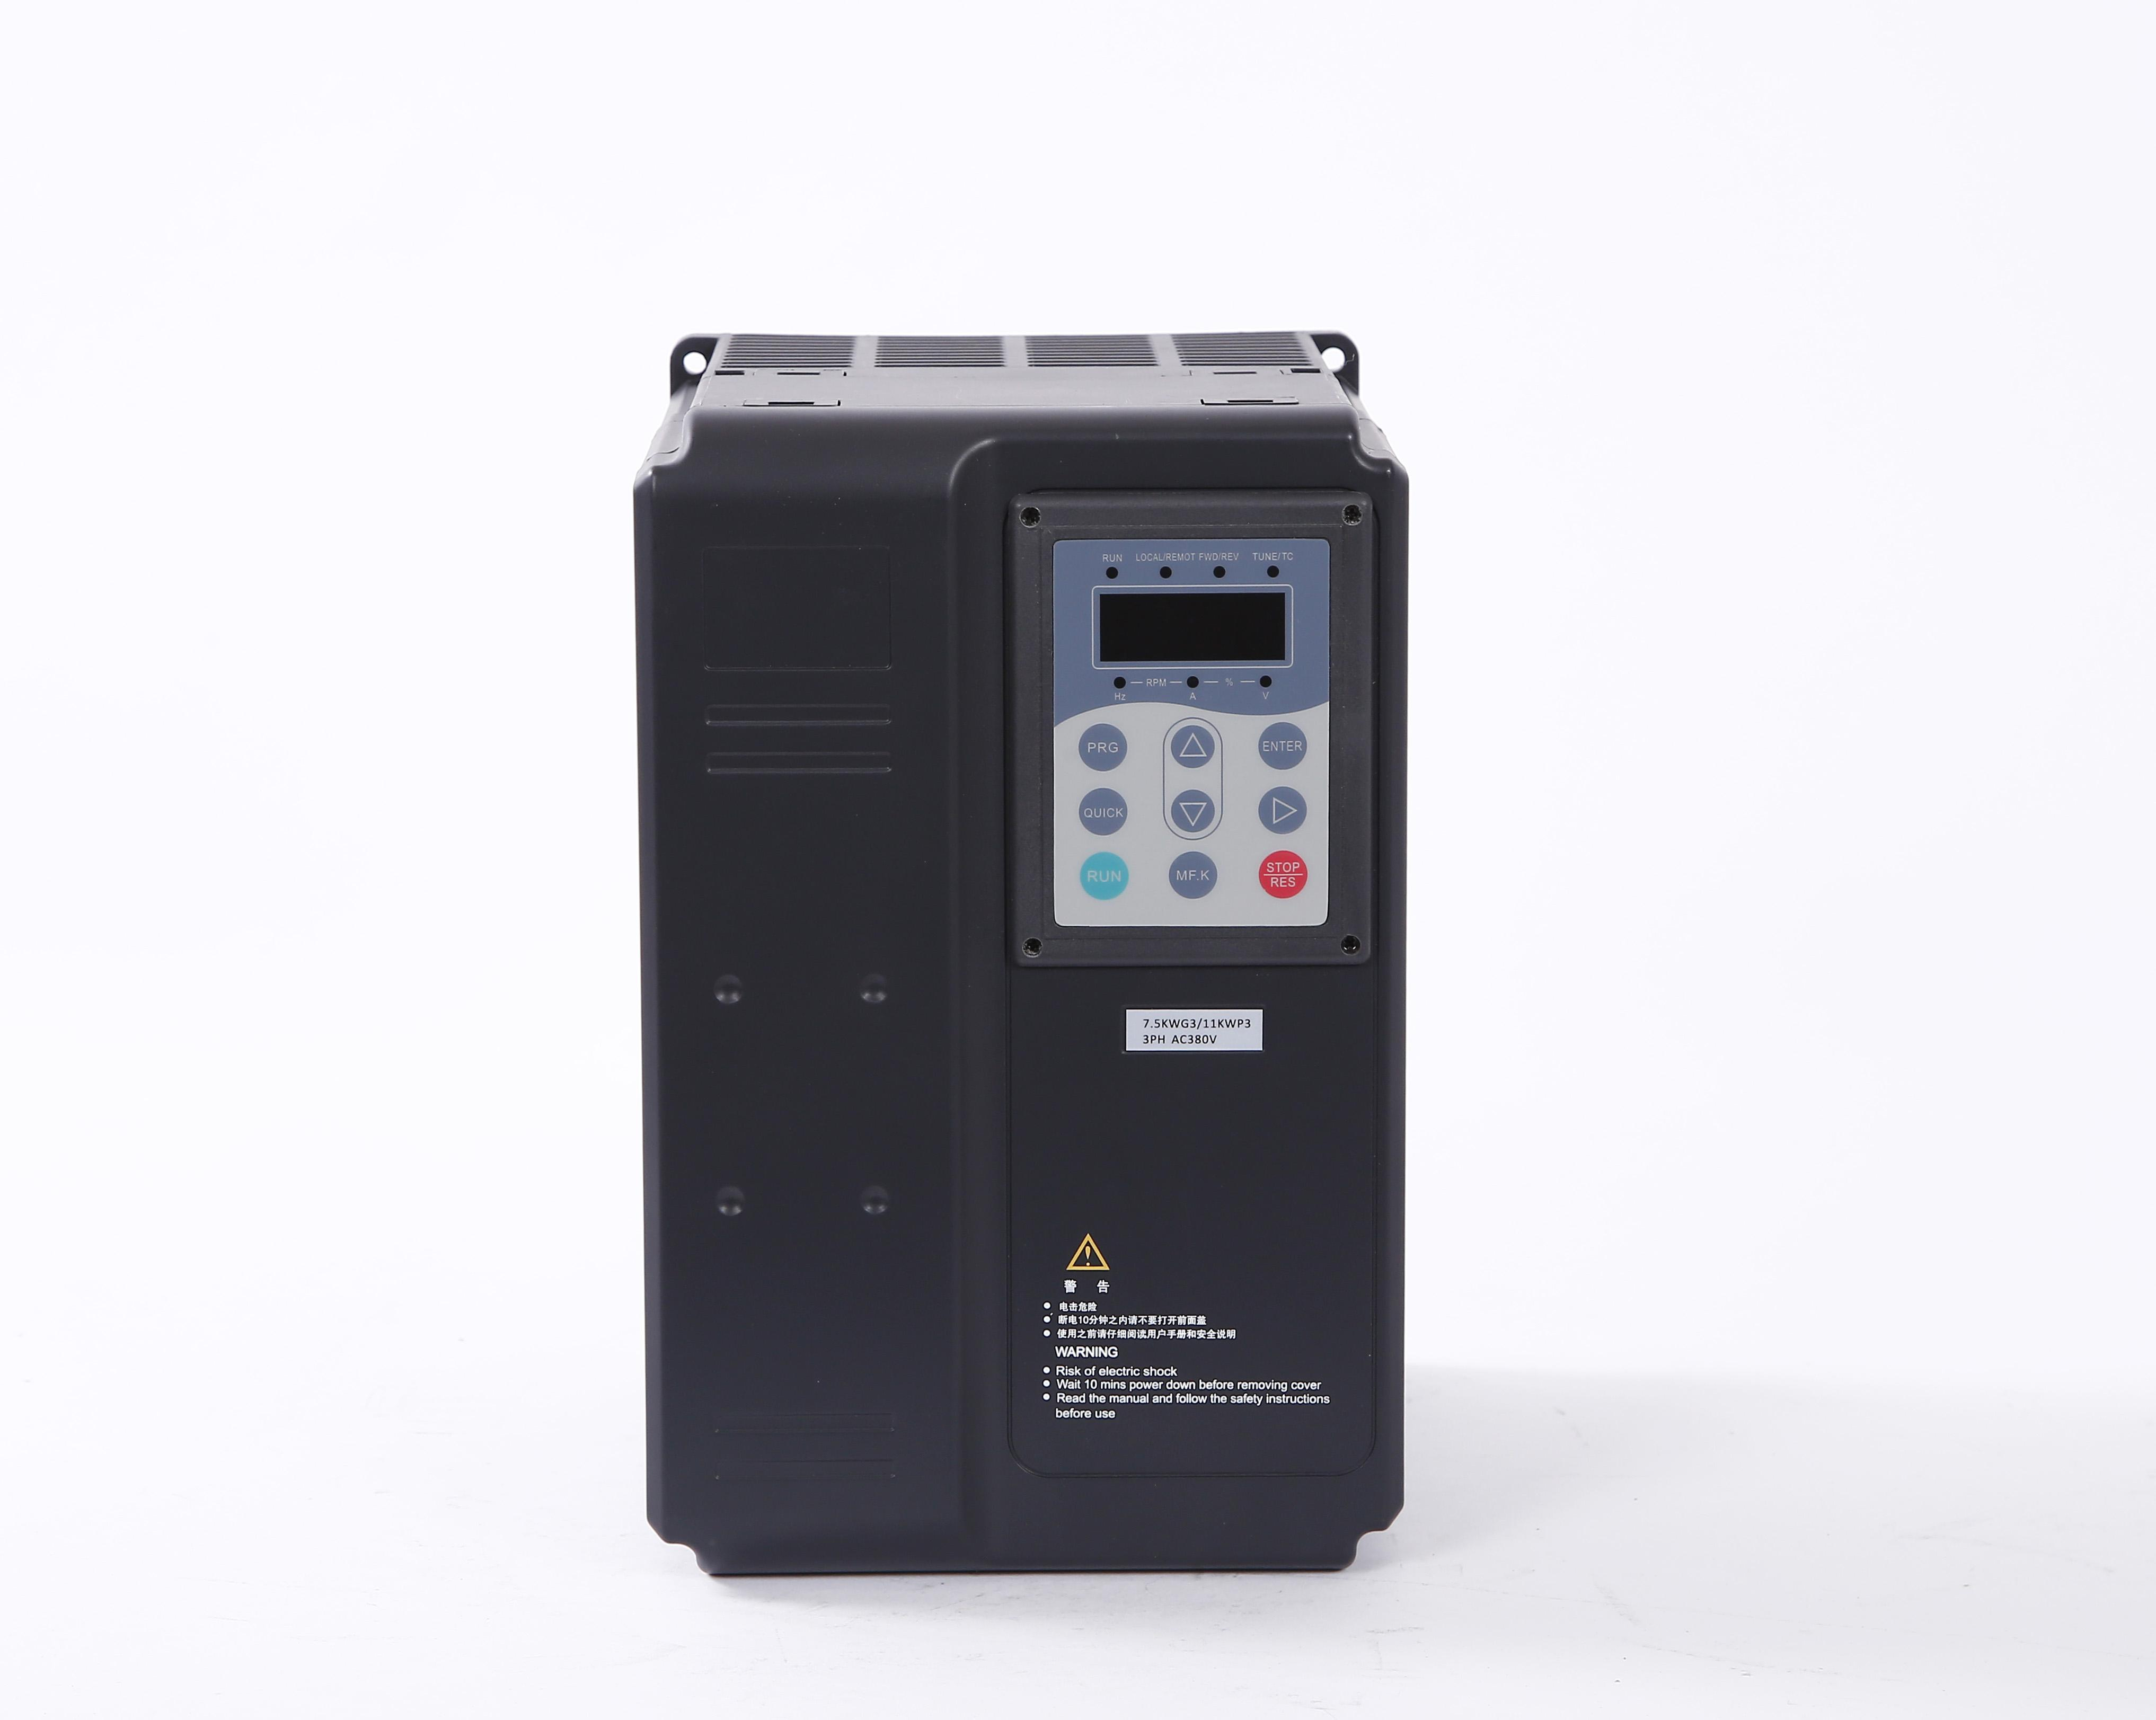 преобразователь 380V7.5-11KW1518.5kw22-30-37-45kw трехэтапного вектор регулирования типа двигателя